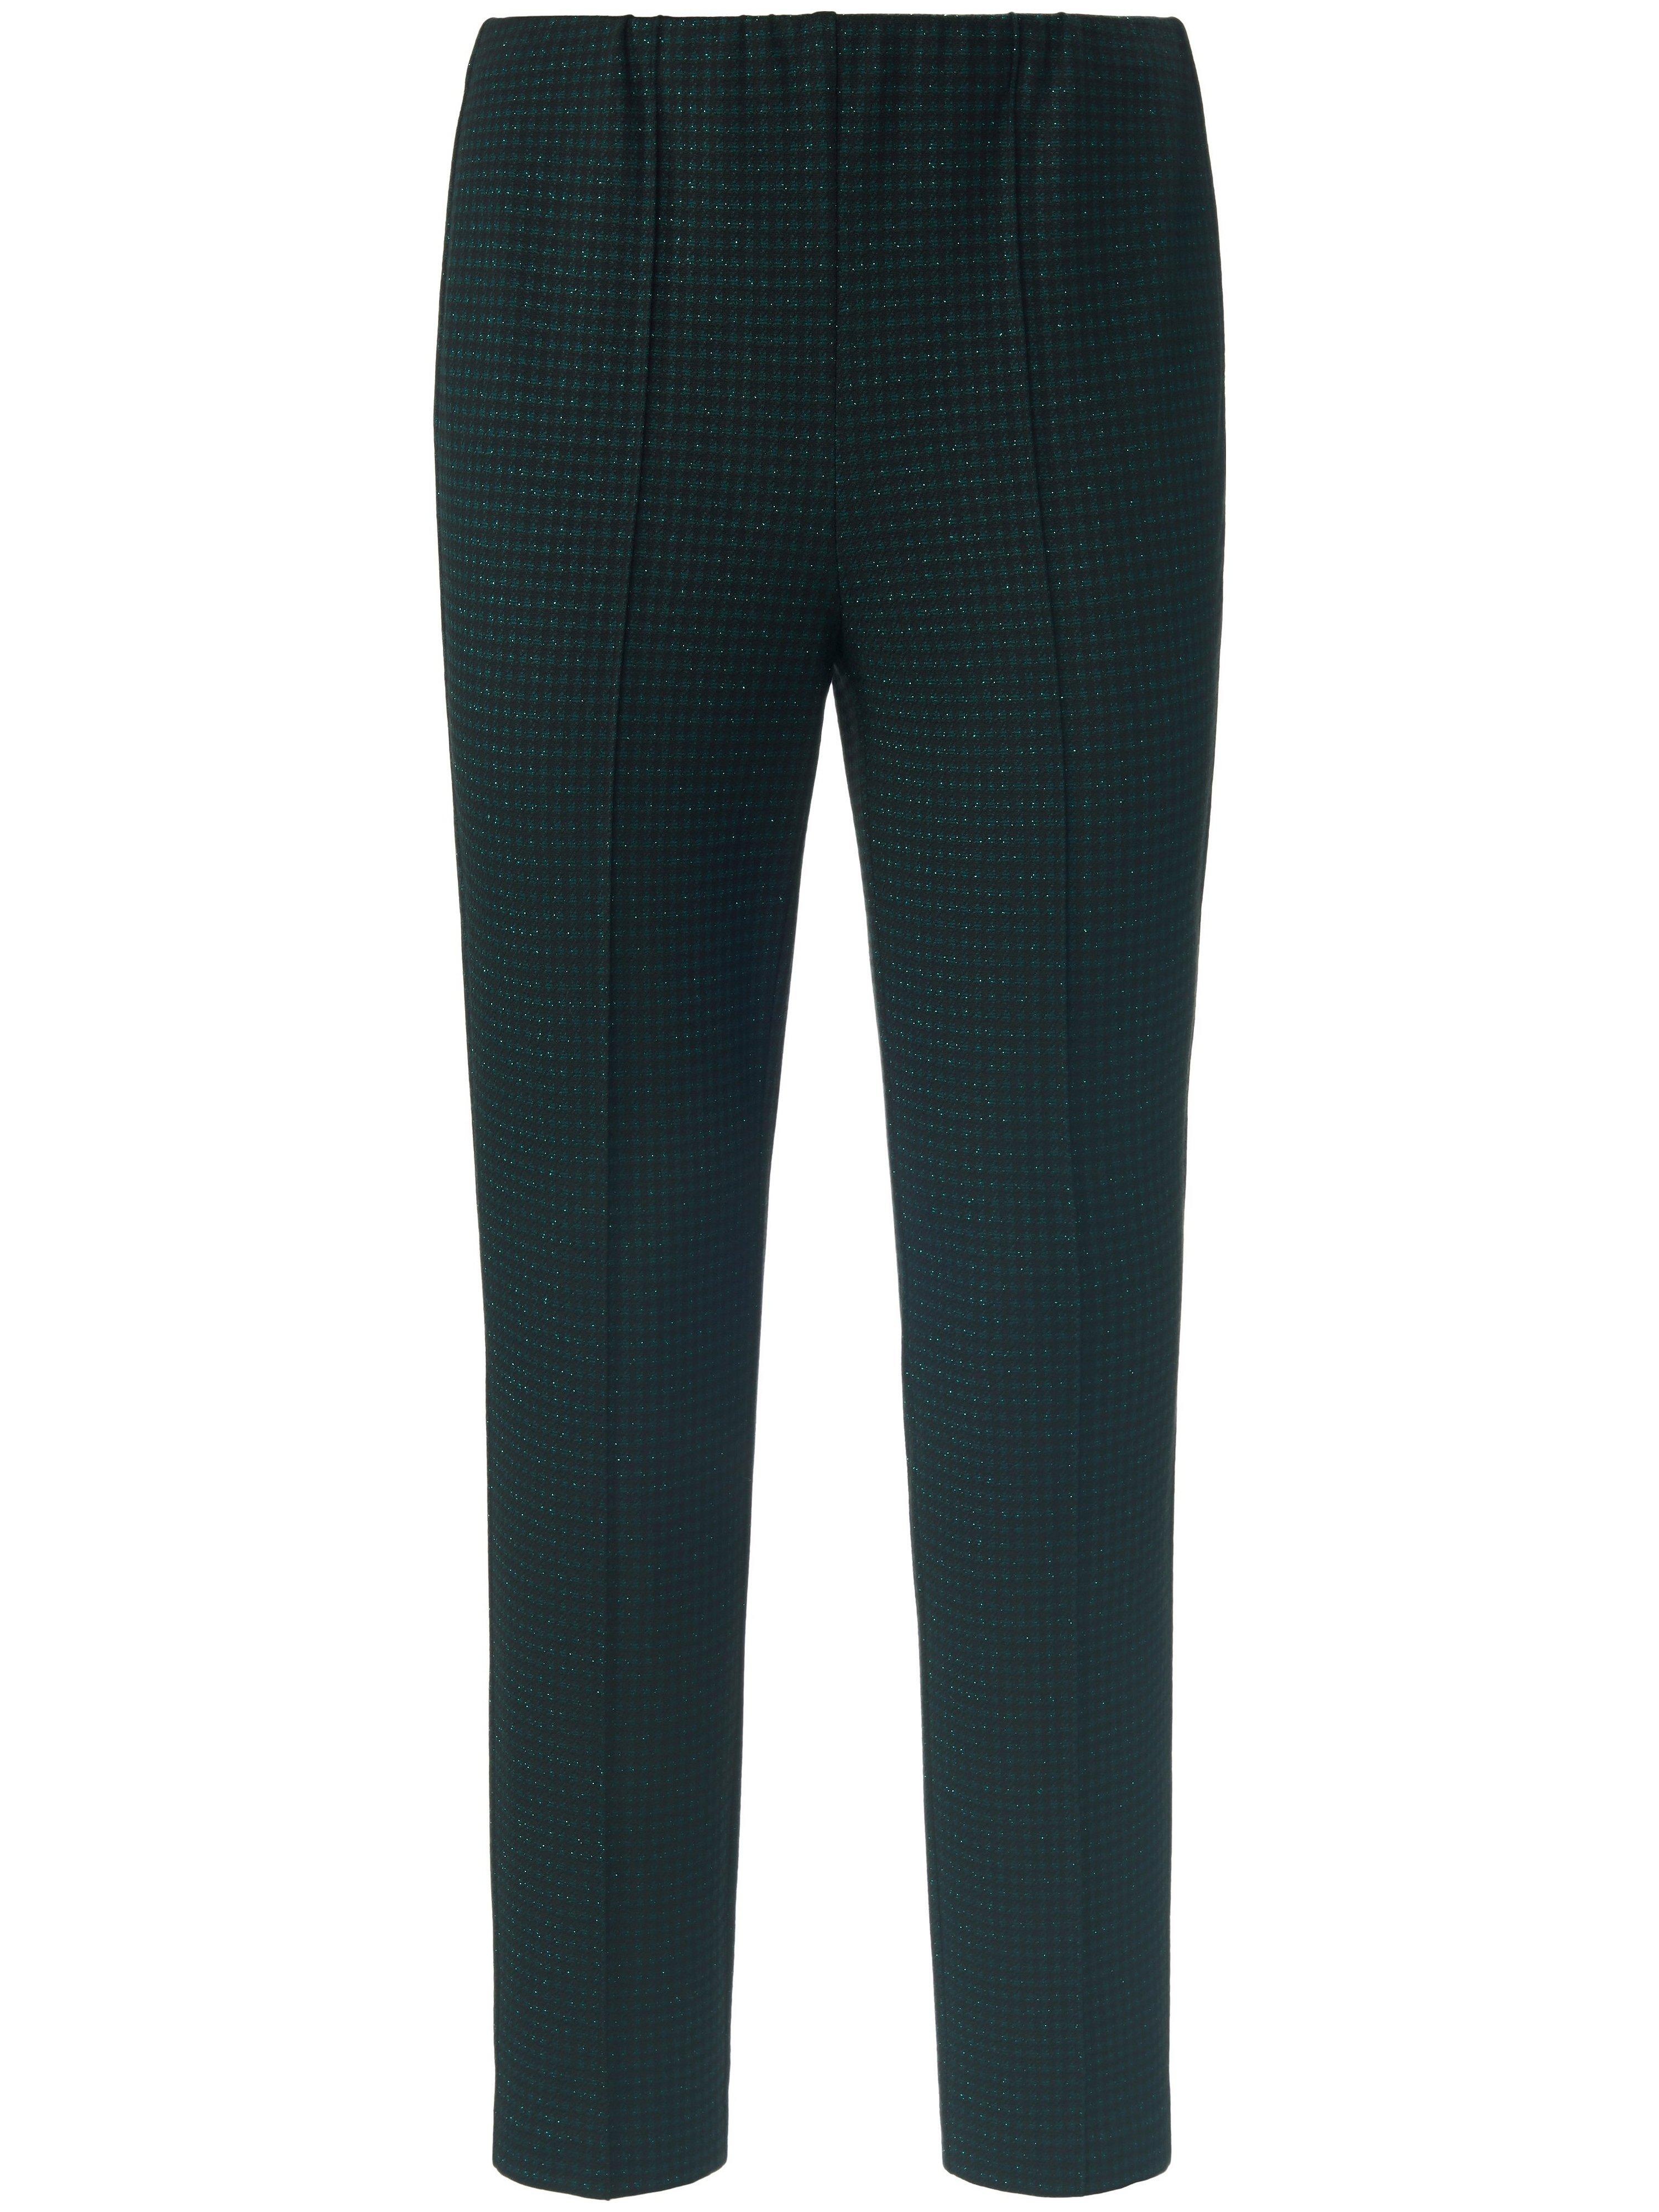 Le pantalon 7/8 jersey coupe Sylvia  Peter Hahn vert taille 21